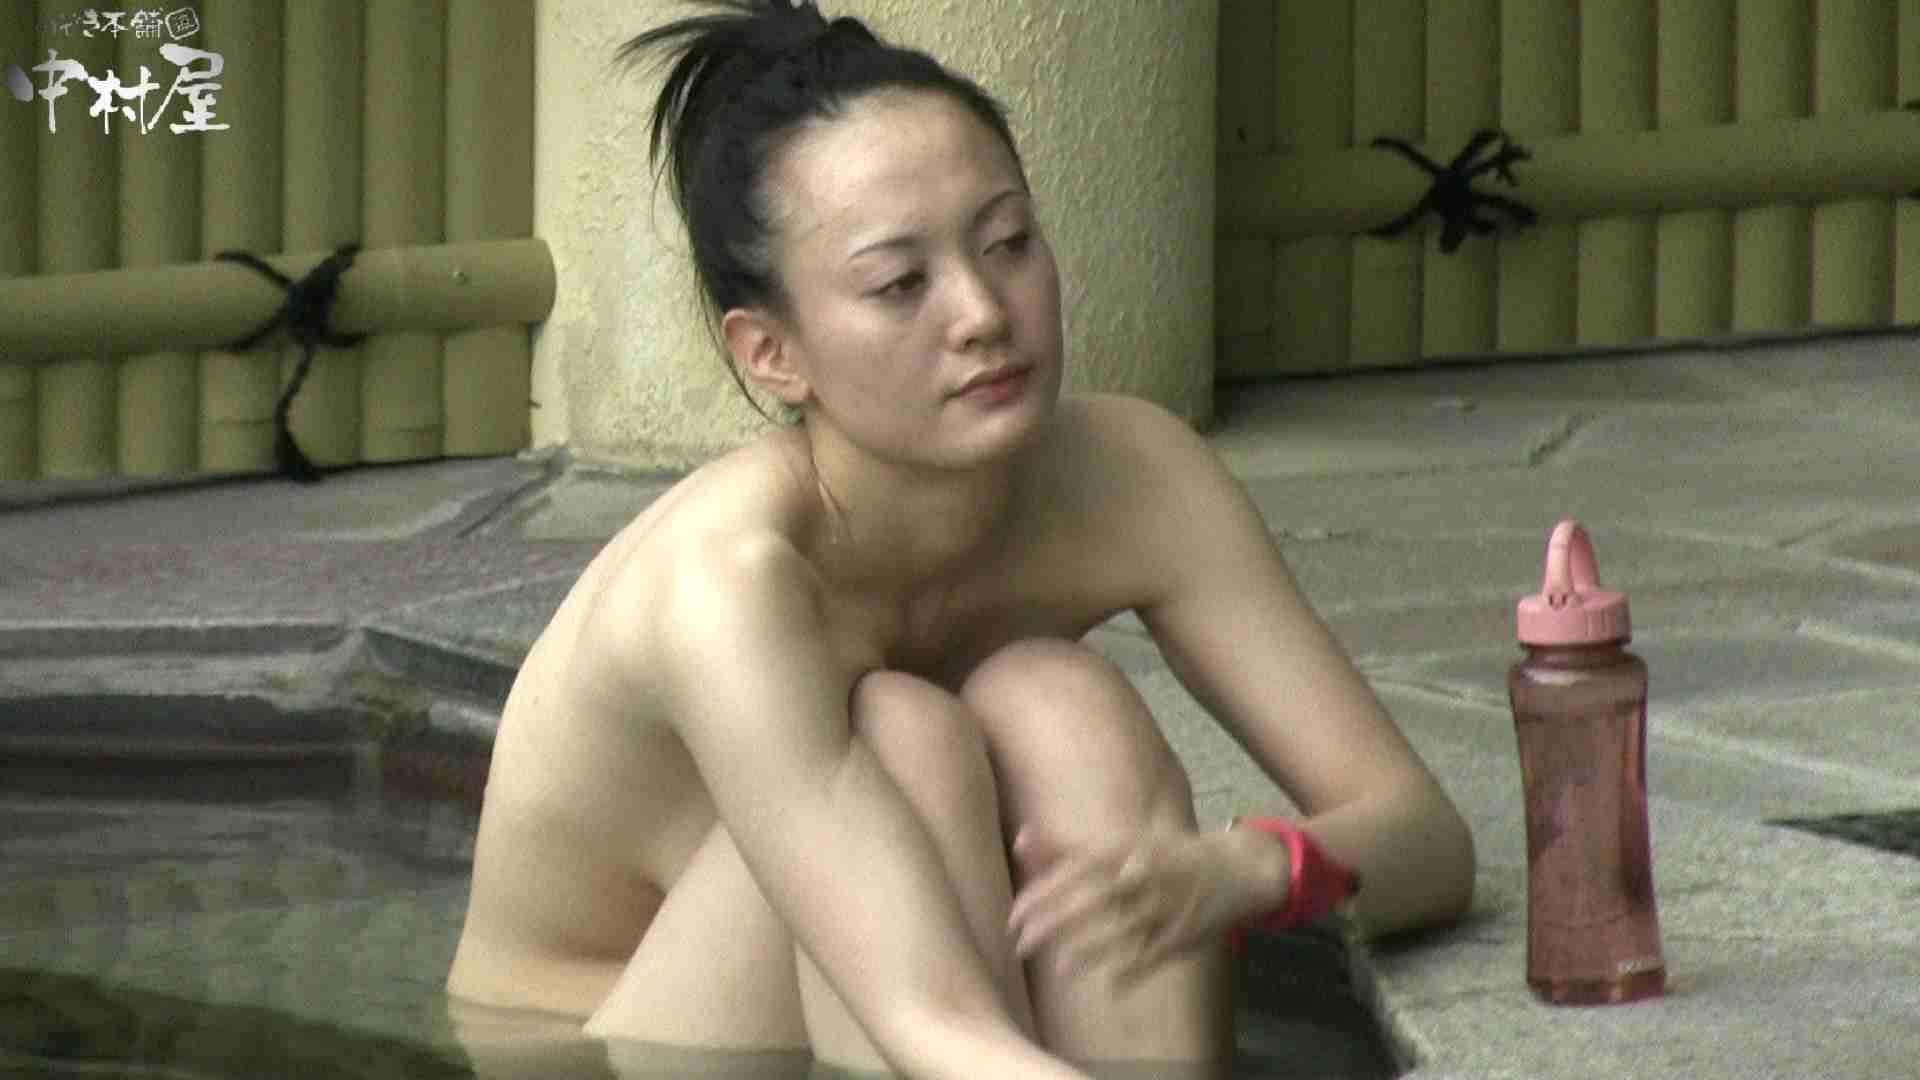 Aquaな露天風呂Vol.900 美しいOLの裸体   露天風呂突入  86pic 67